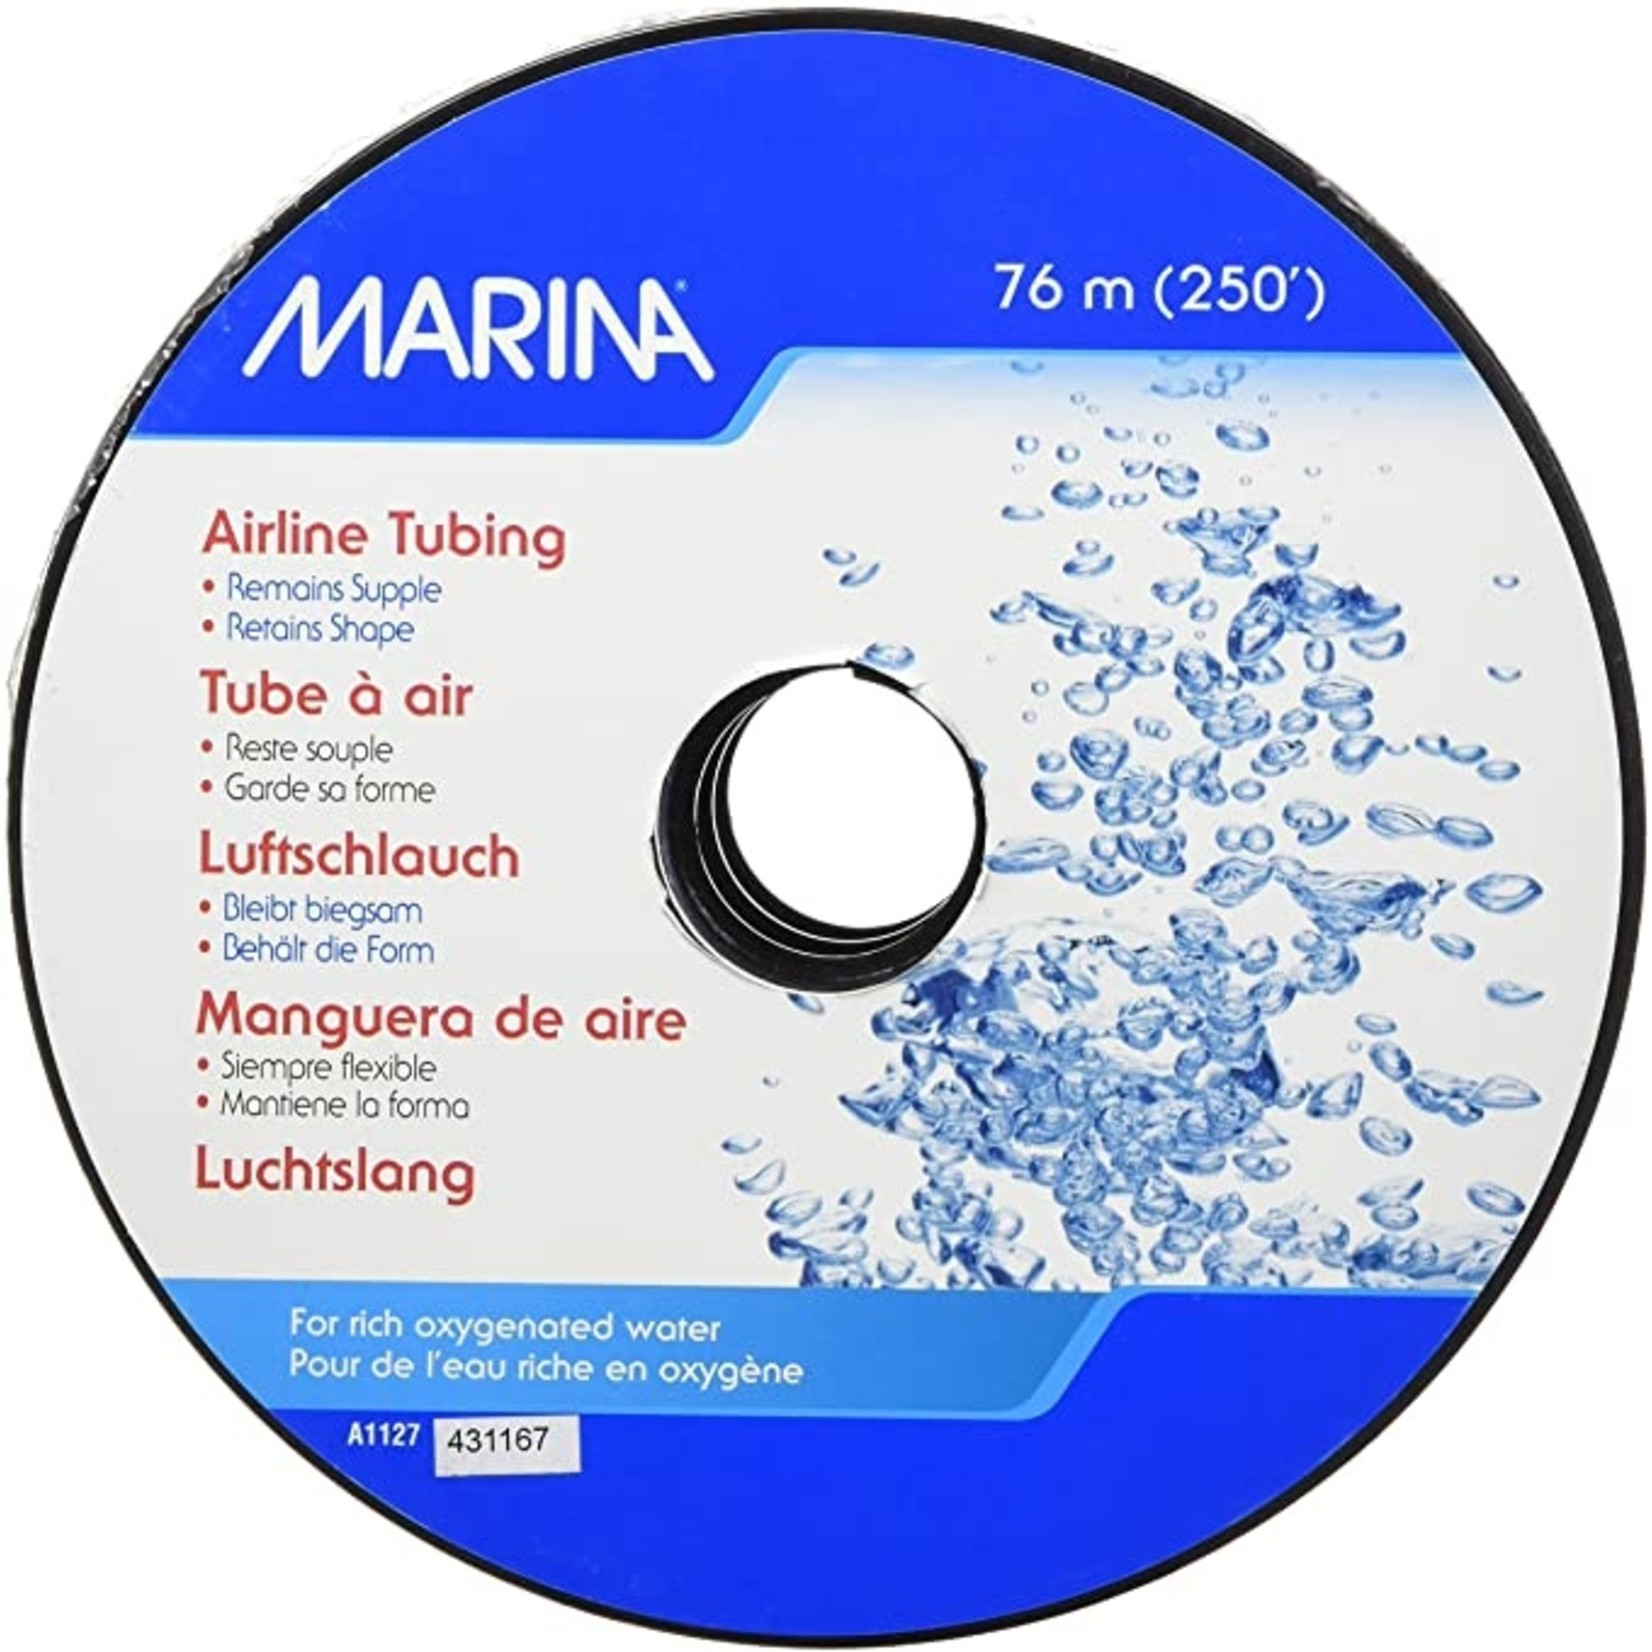 "Marina MARINA FLEXAIR AIRLINE TUBING 1/4"""